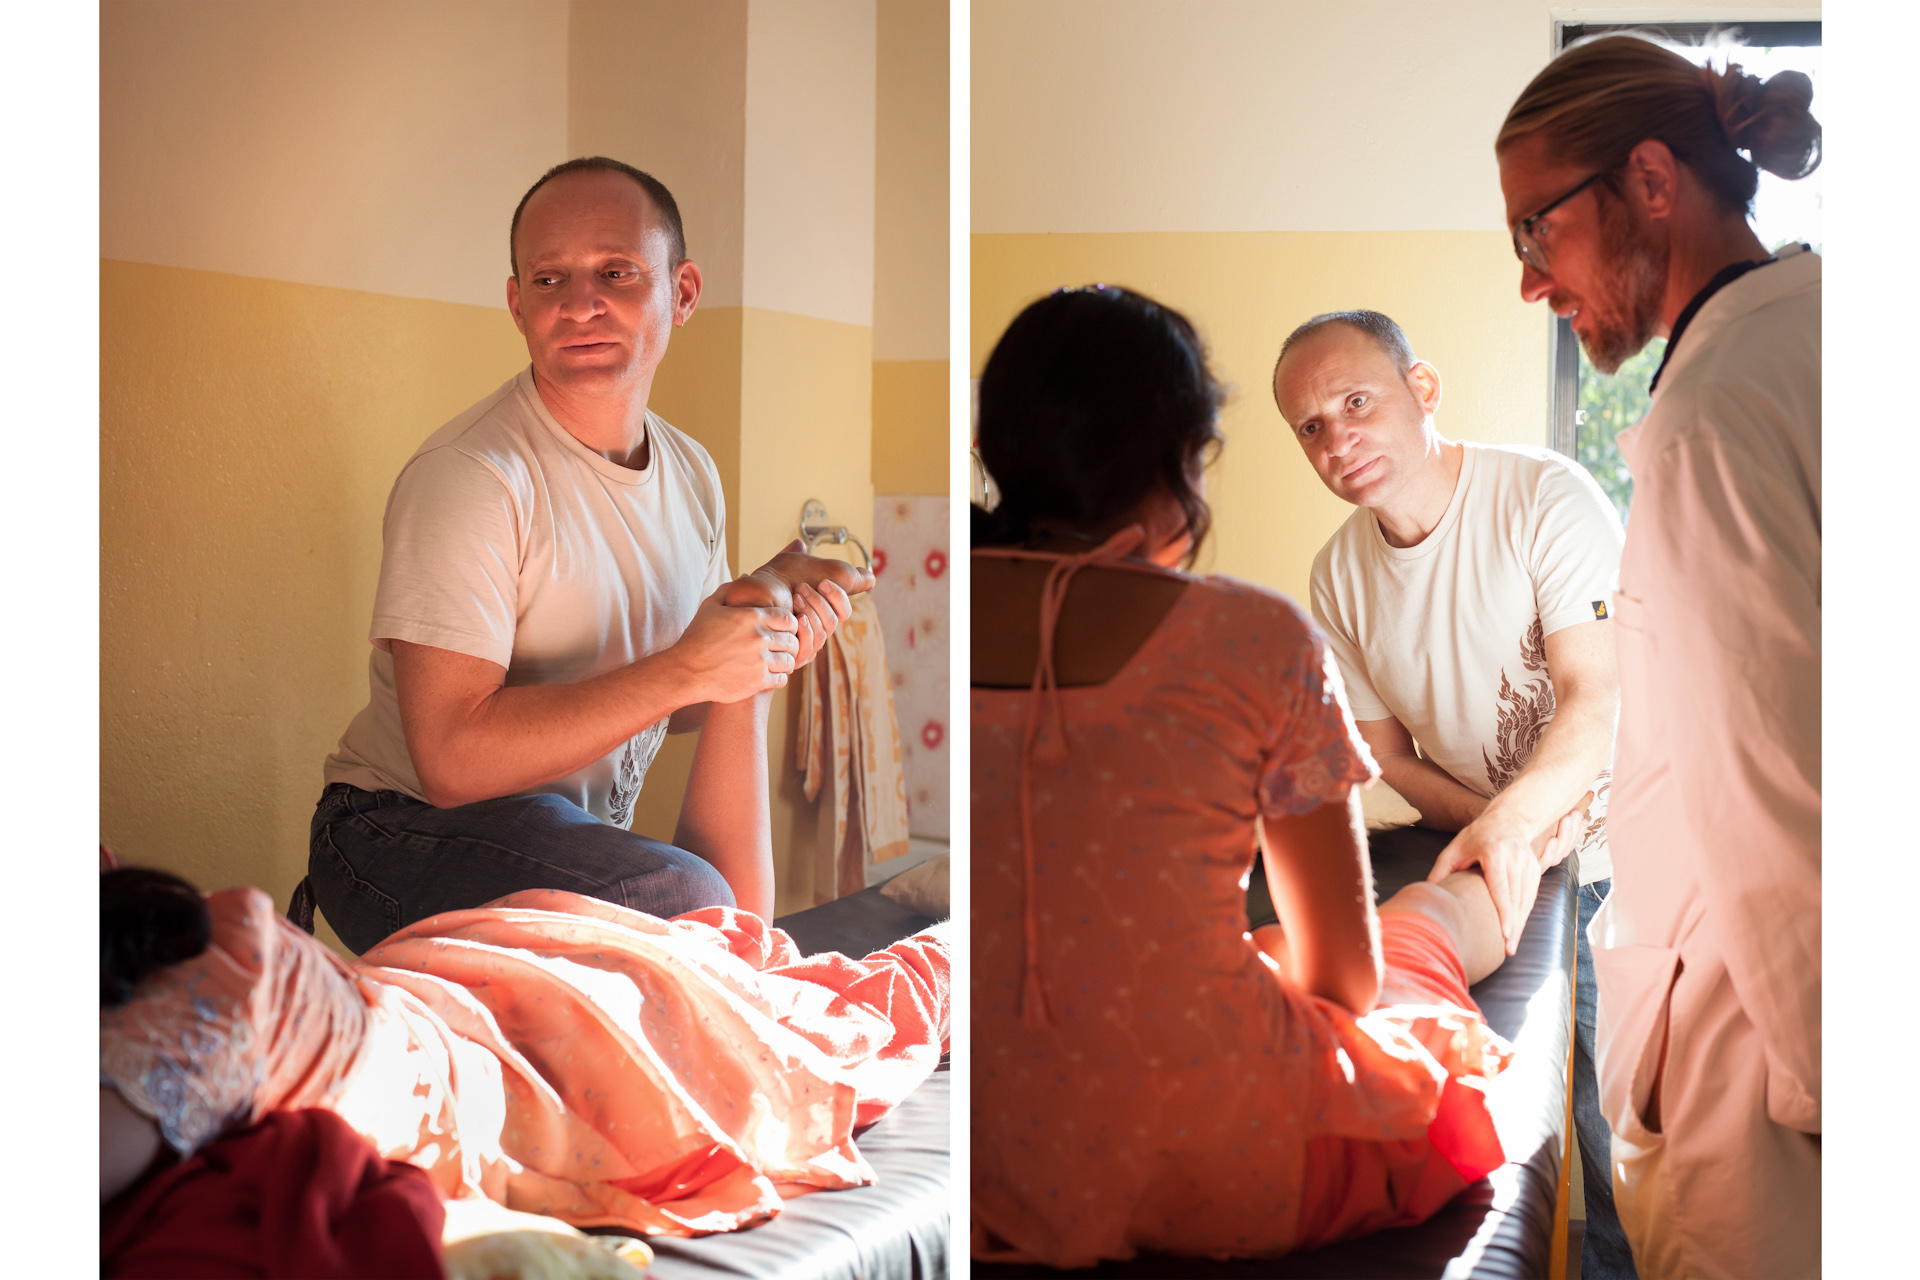 Humanitarian-Acupuncture-Mindful-Medicine-Nepal-Namo-buddha-06.JPG